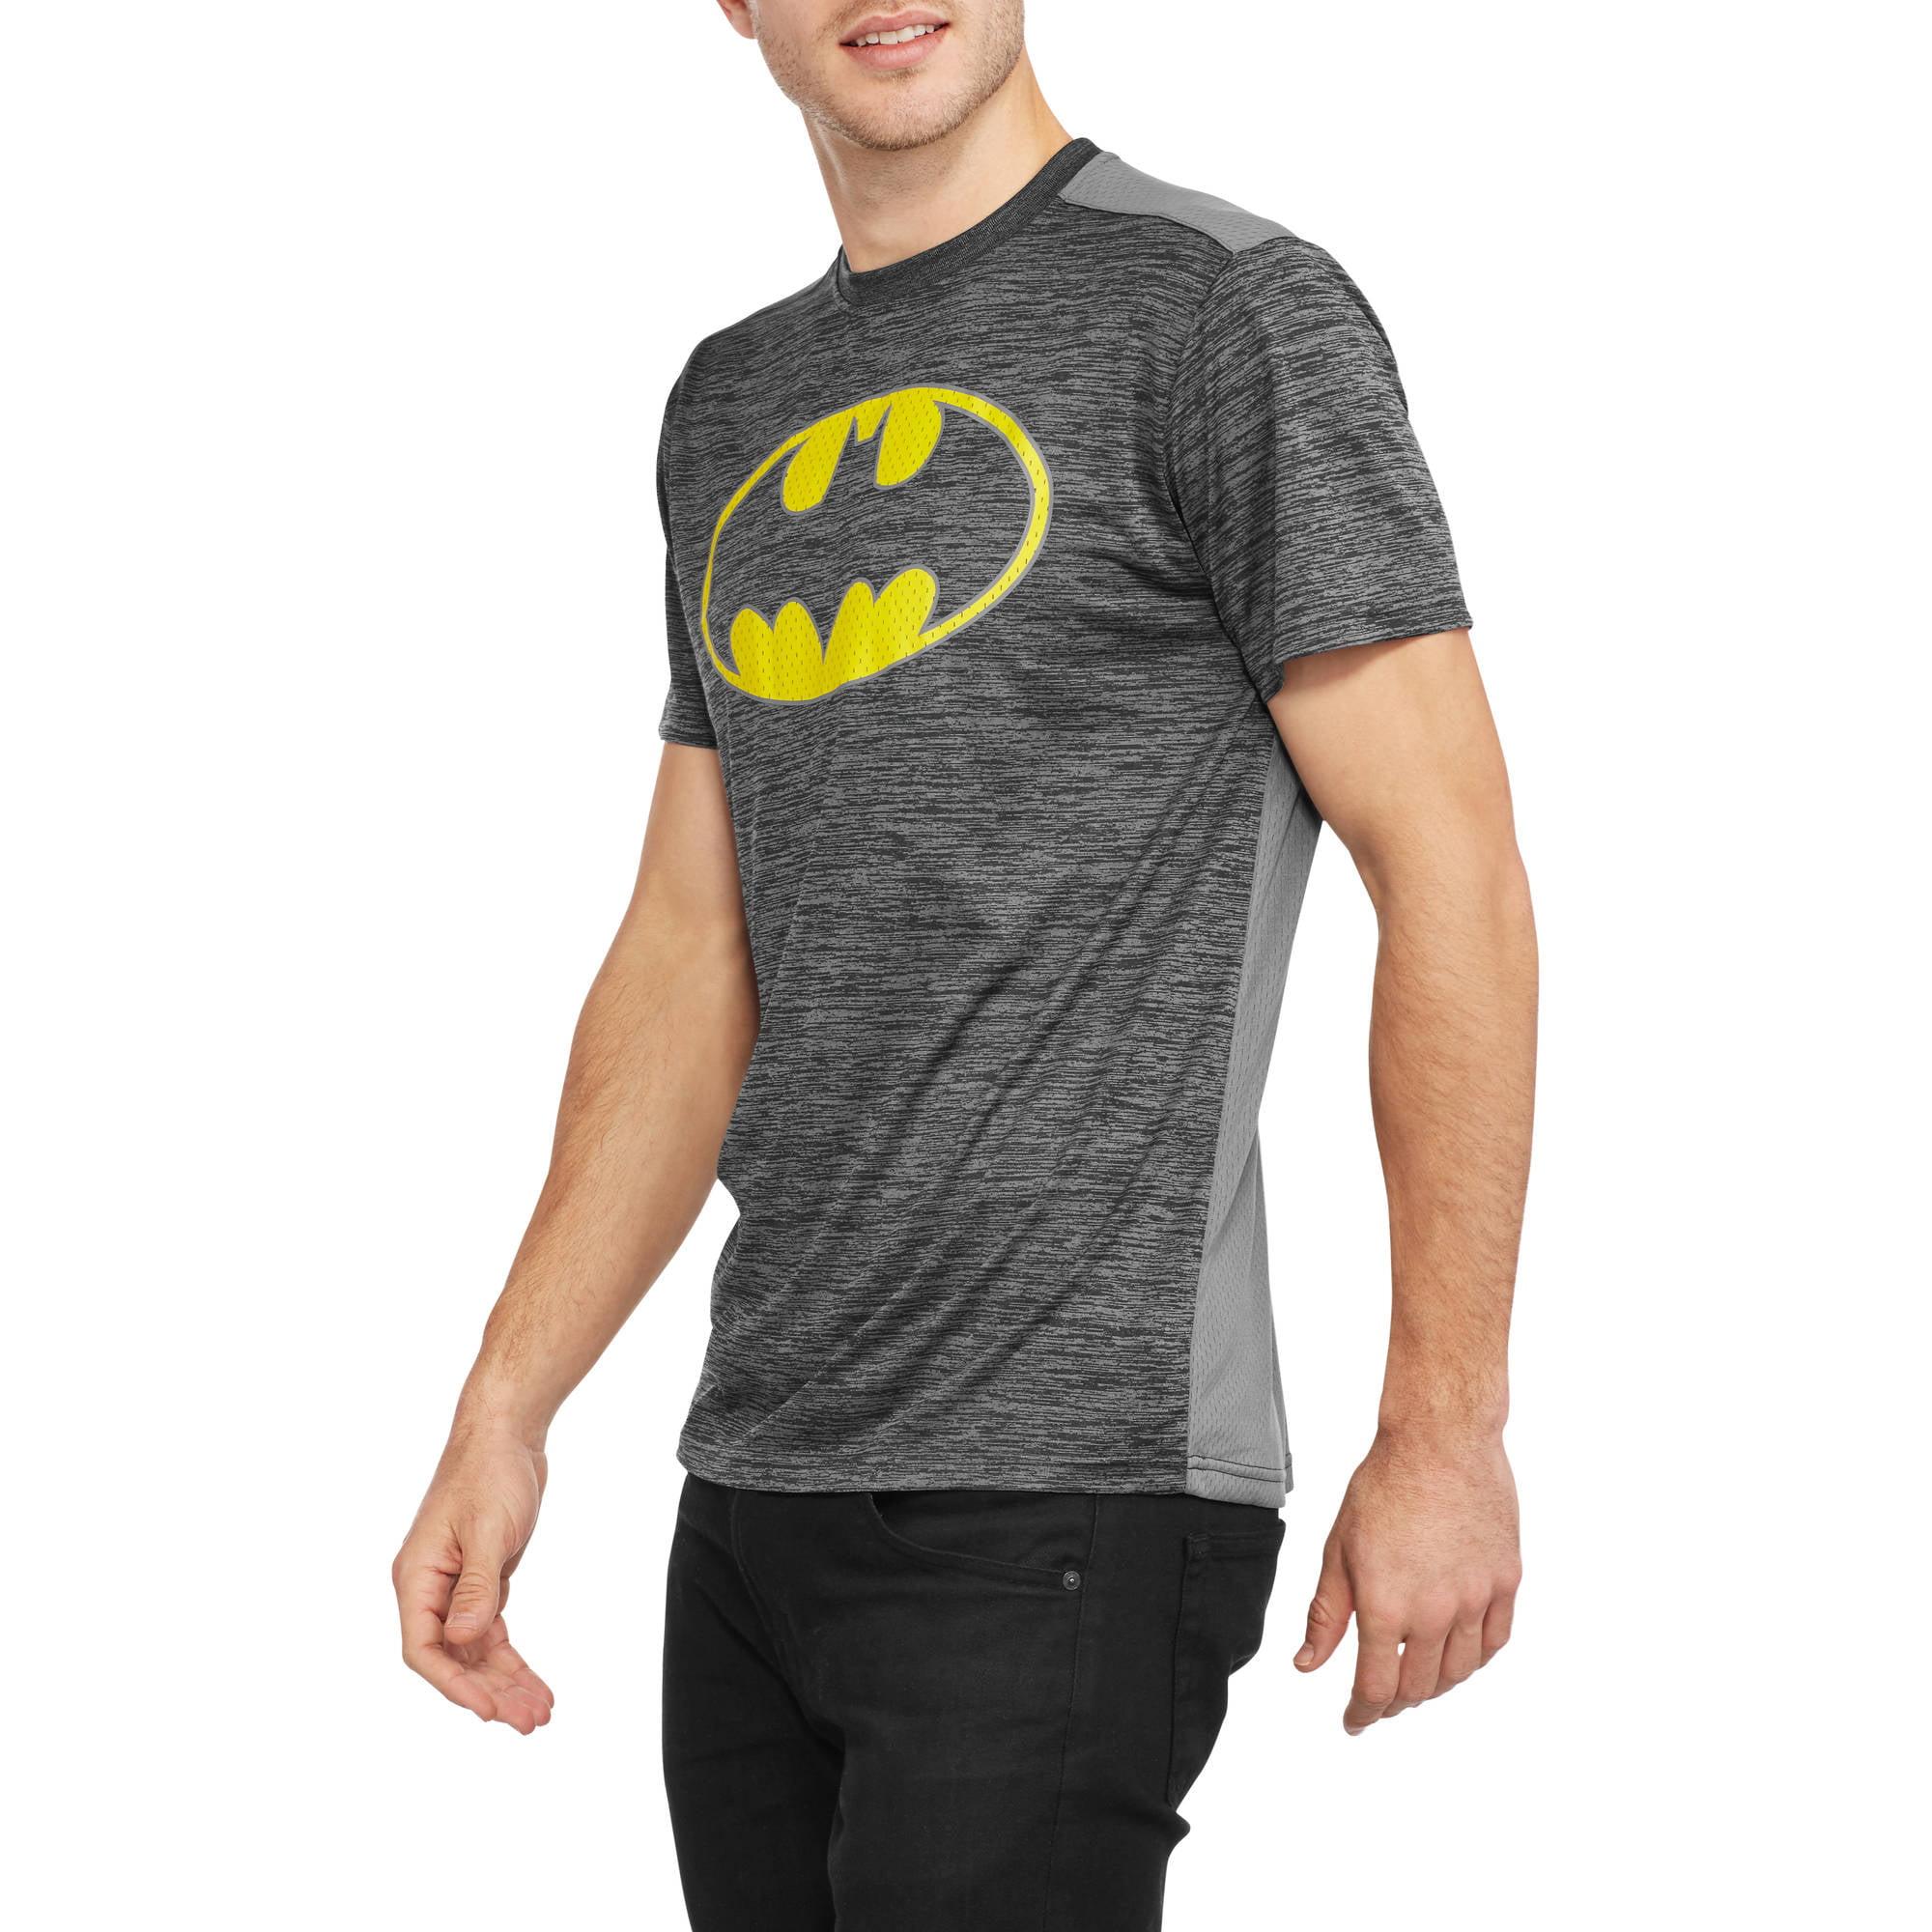 DC Comics Big Men's Batman Logo Poly Mesh Tee, 2XL by